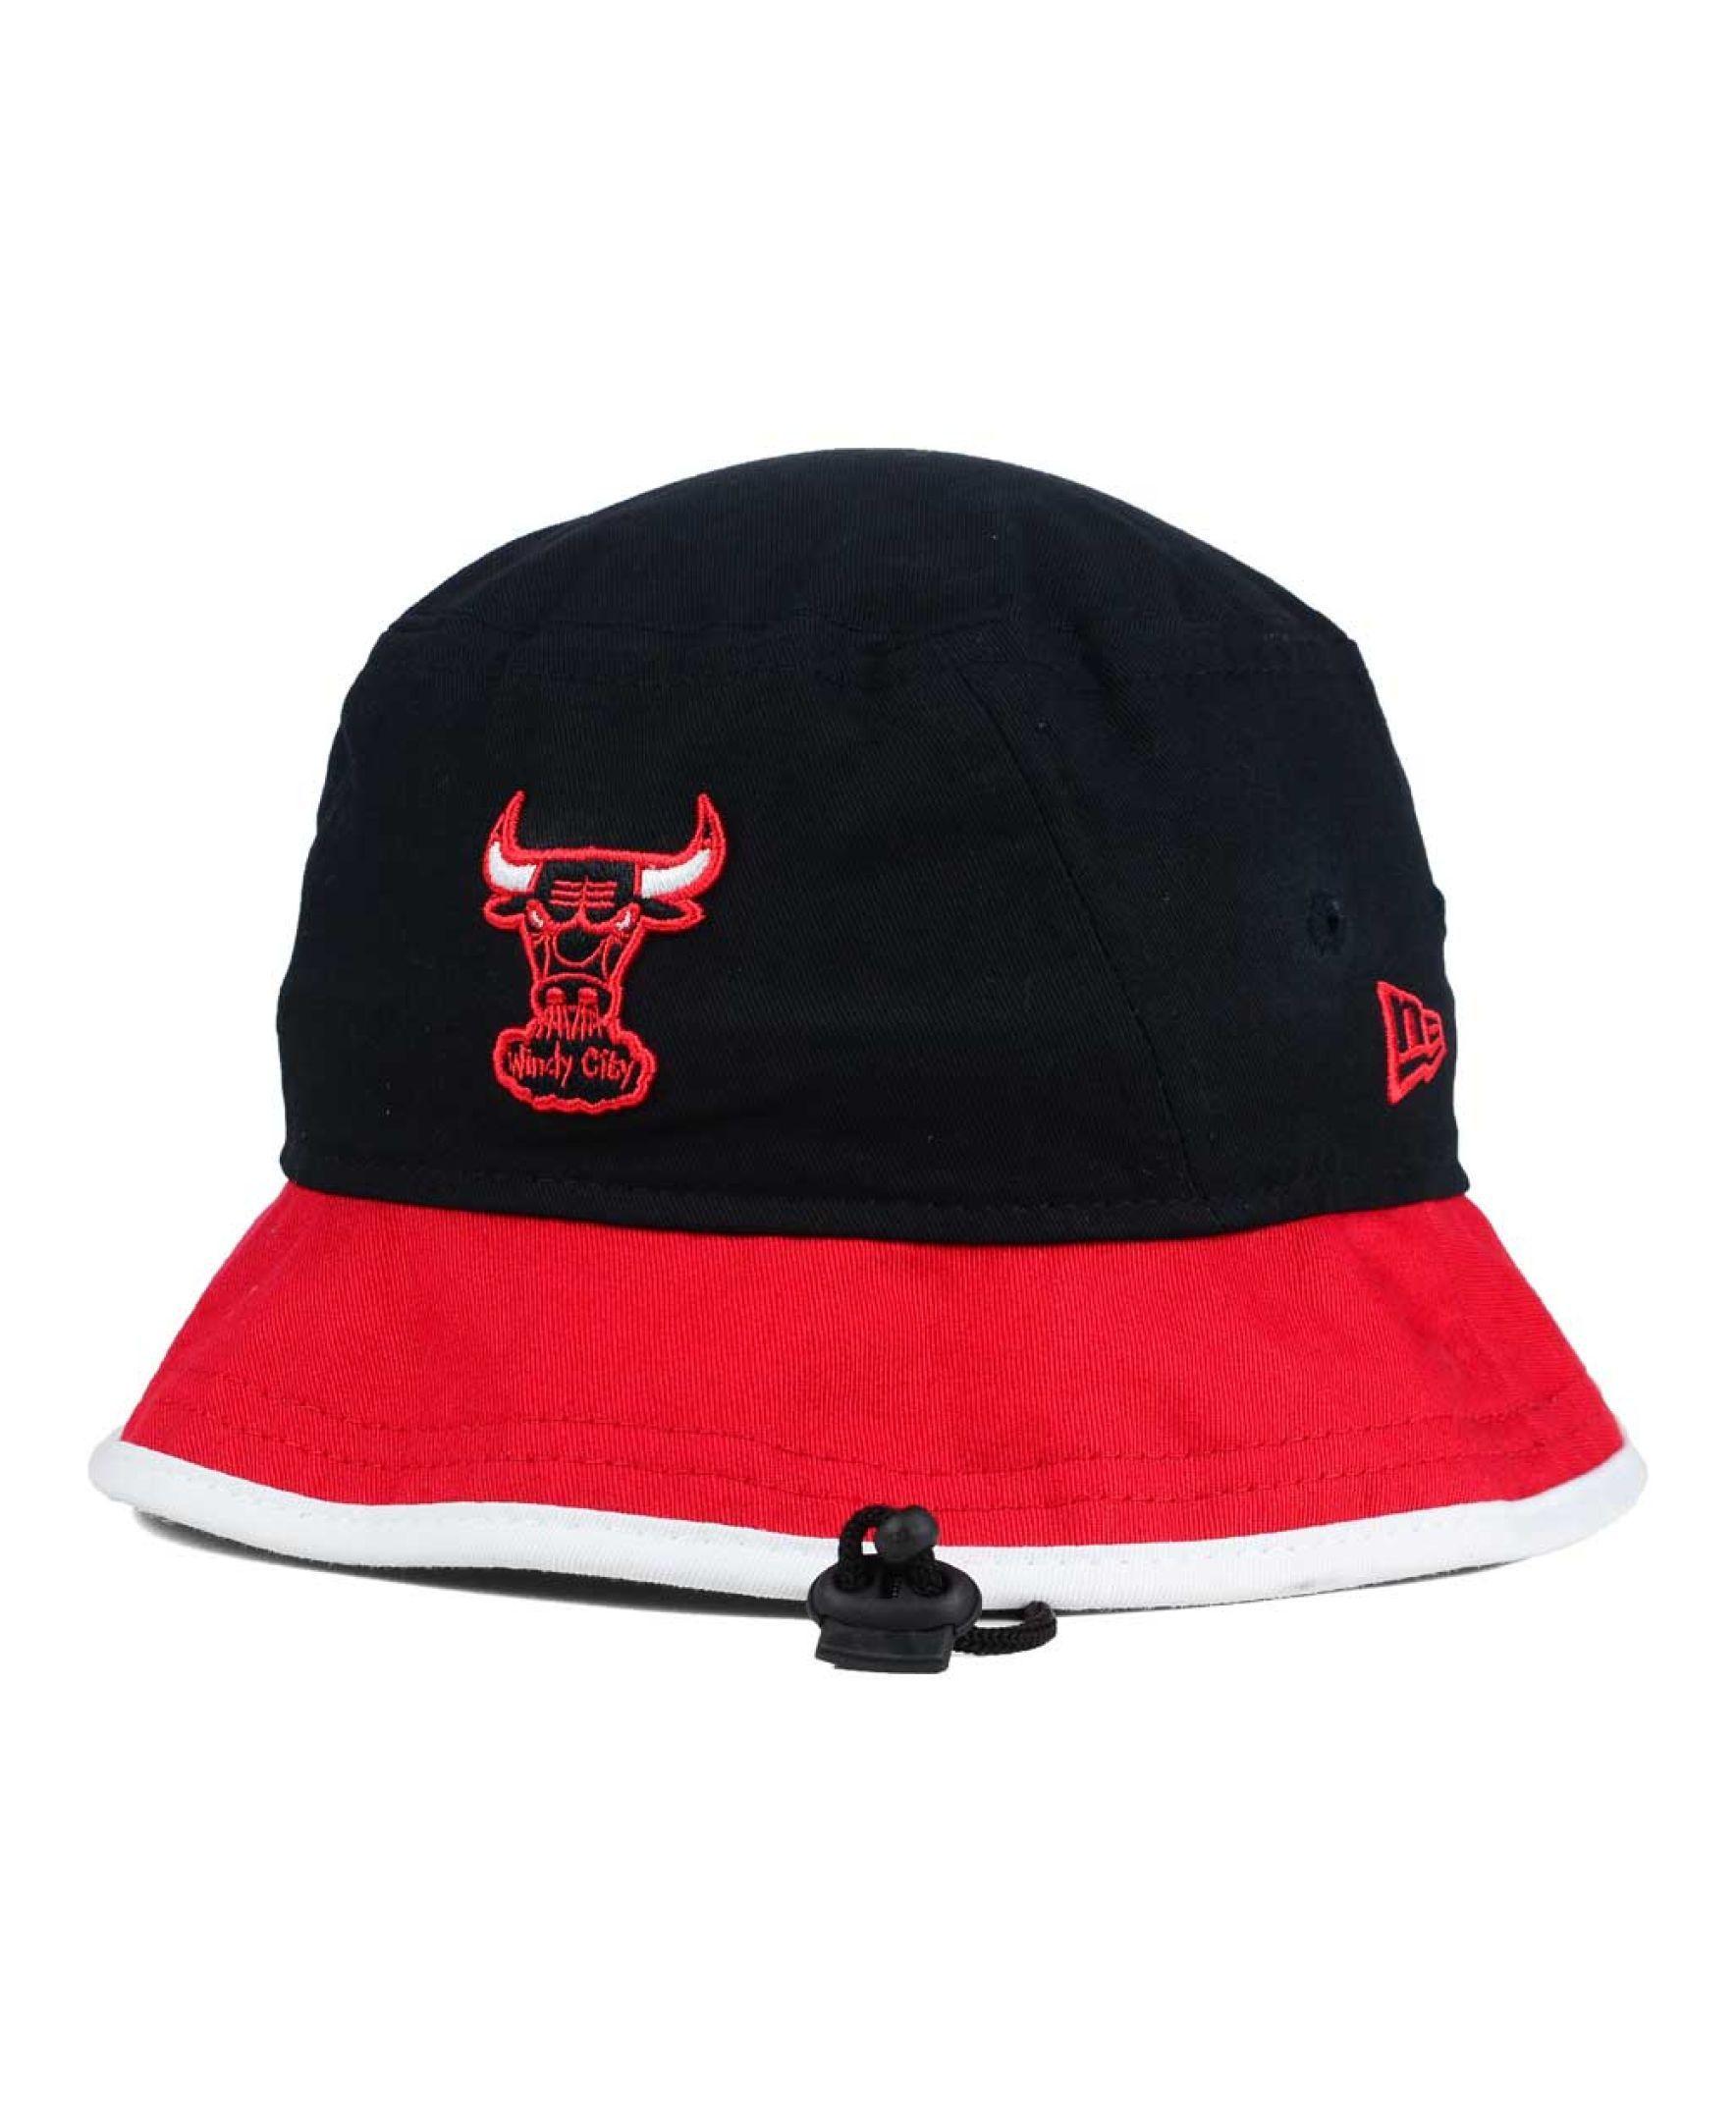 5397a01f946 New Era Chicago Bulls Black-Top Bucket Hat